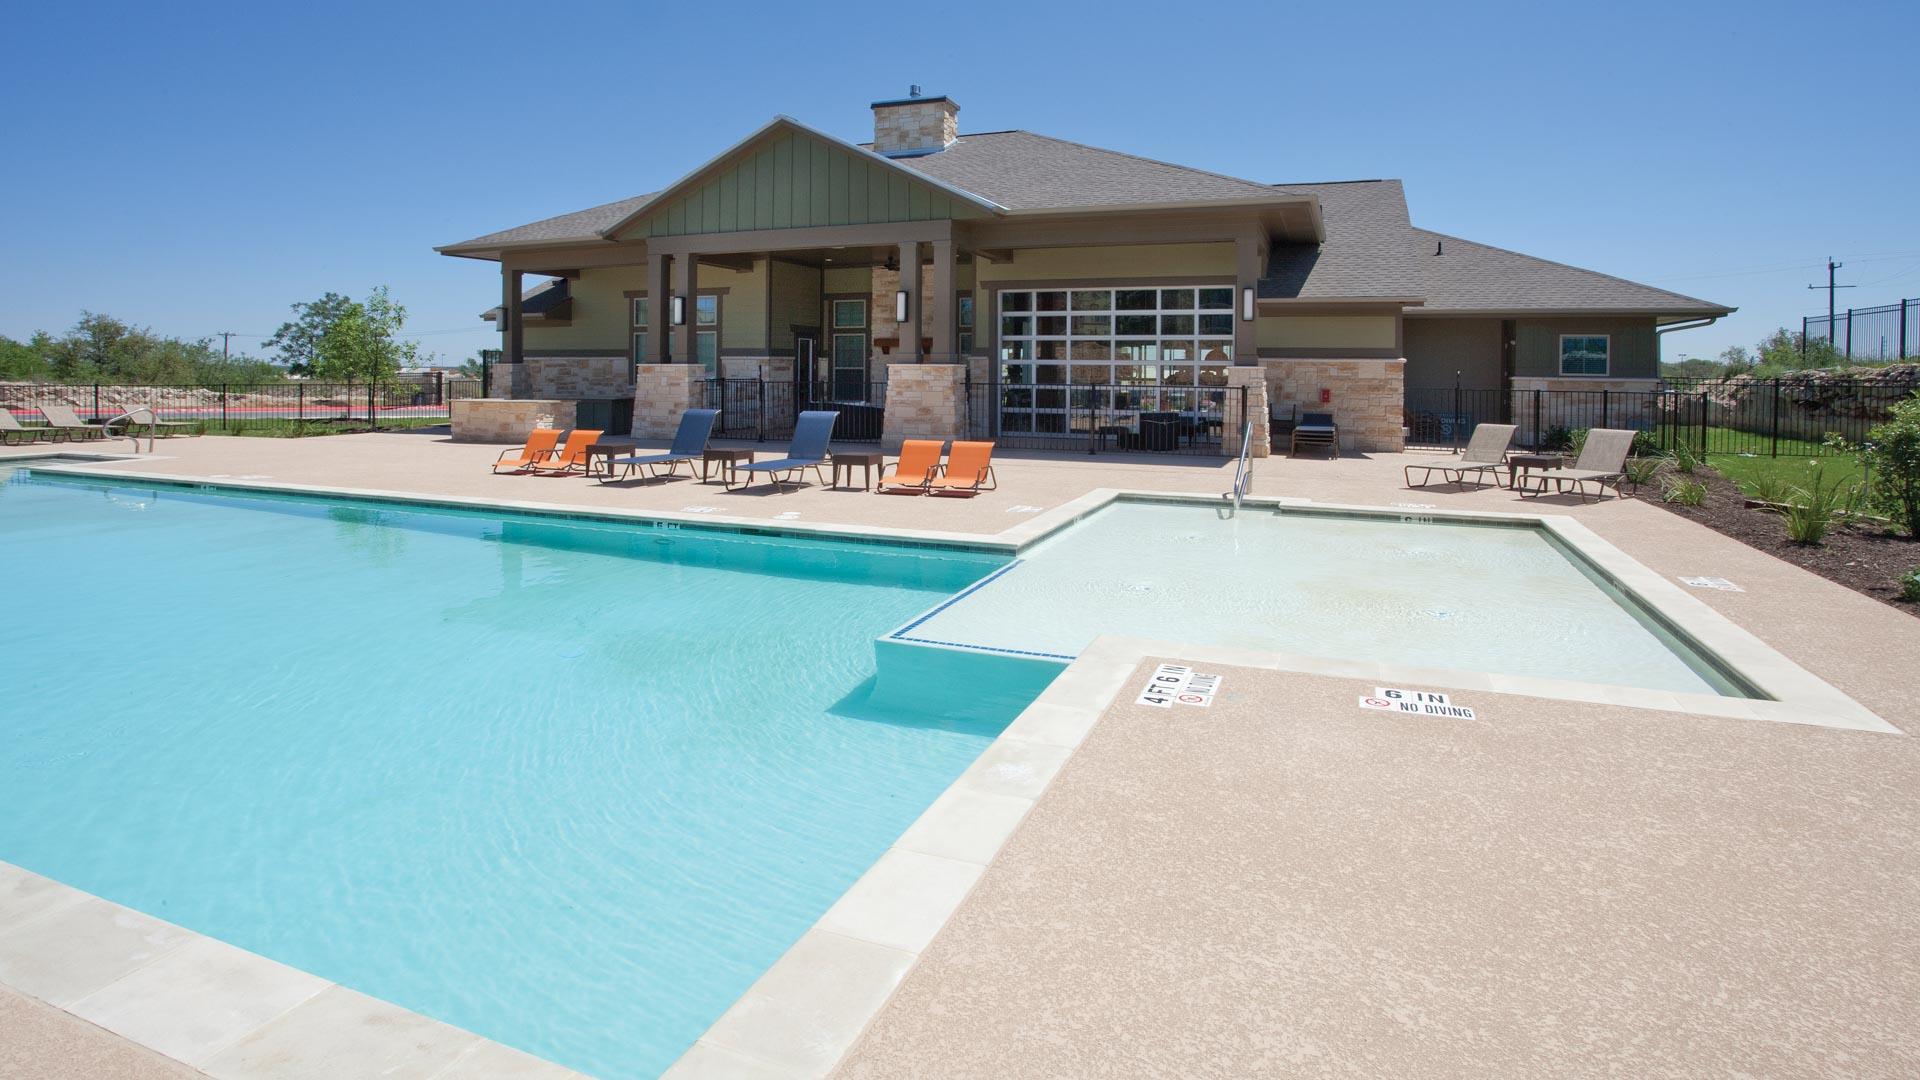 Pool in San Antonio at Springs at Alamo Ranch Apartments